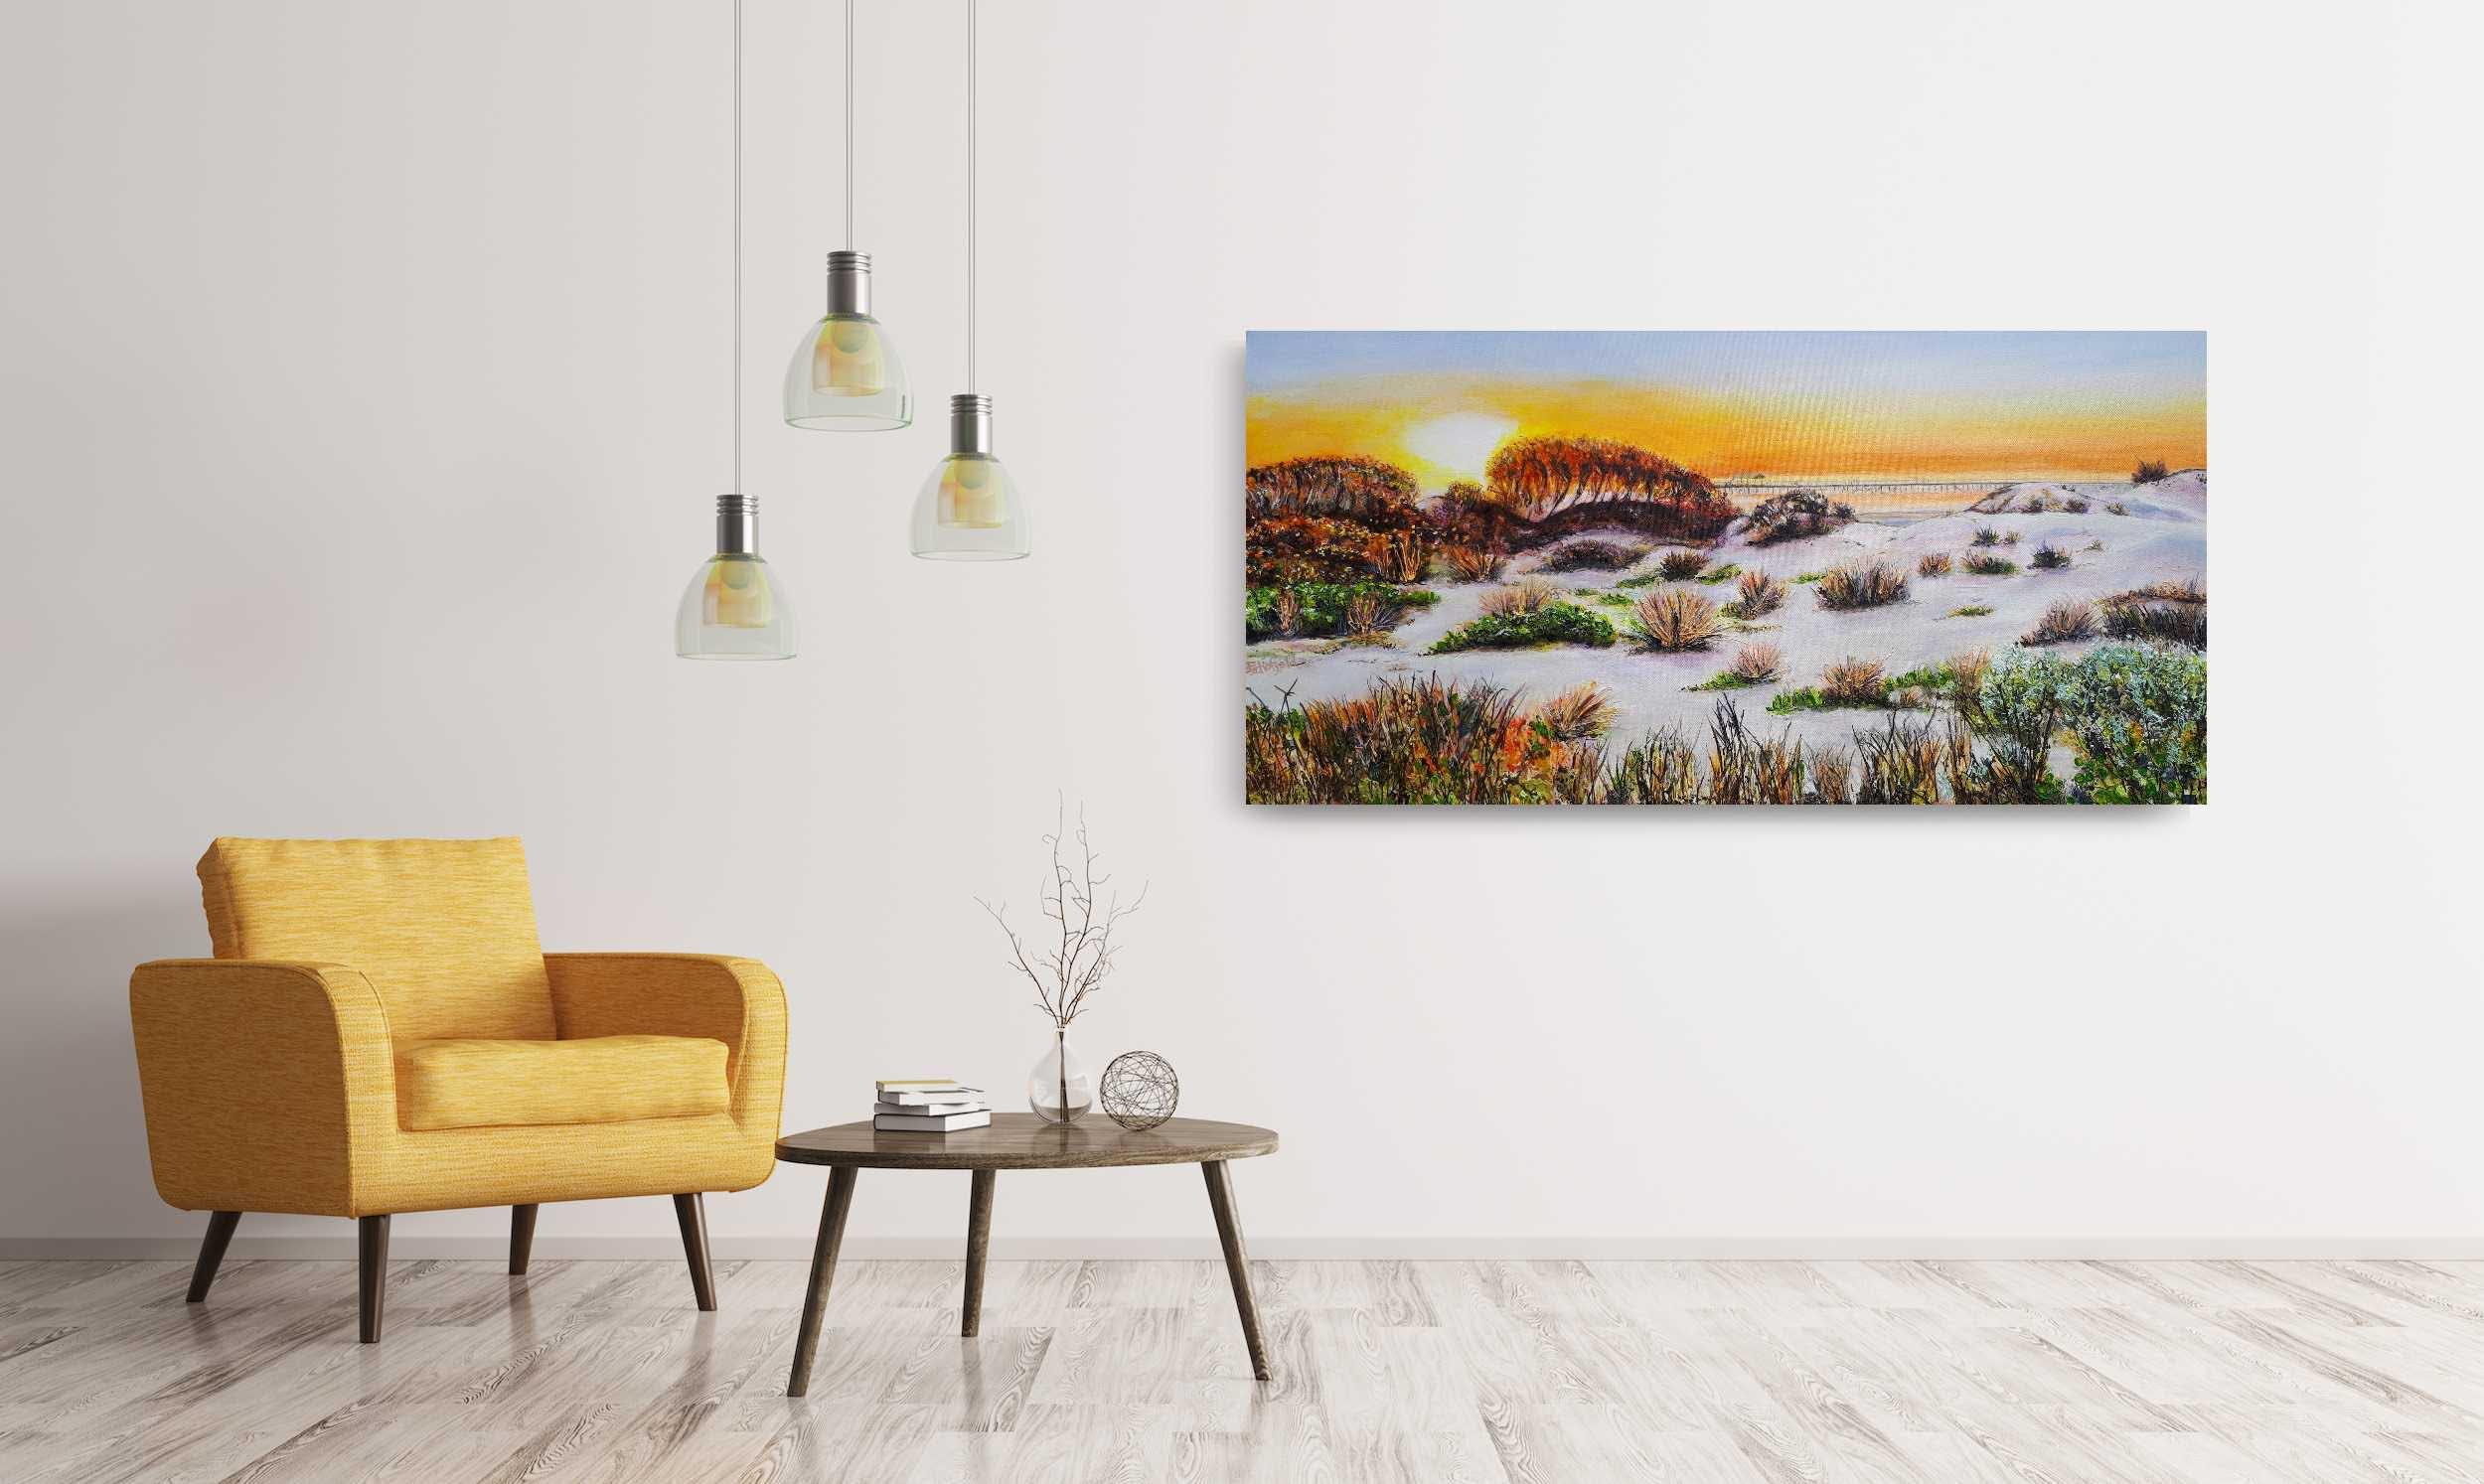 ©Julie Schofield, Golden Evening, Acrylic on Canvas, 45.5 x 91cm